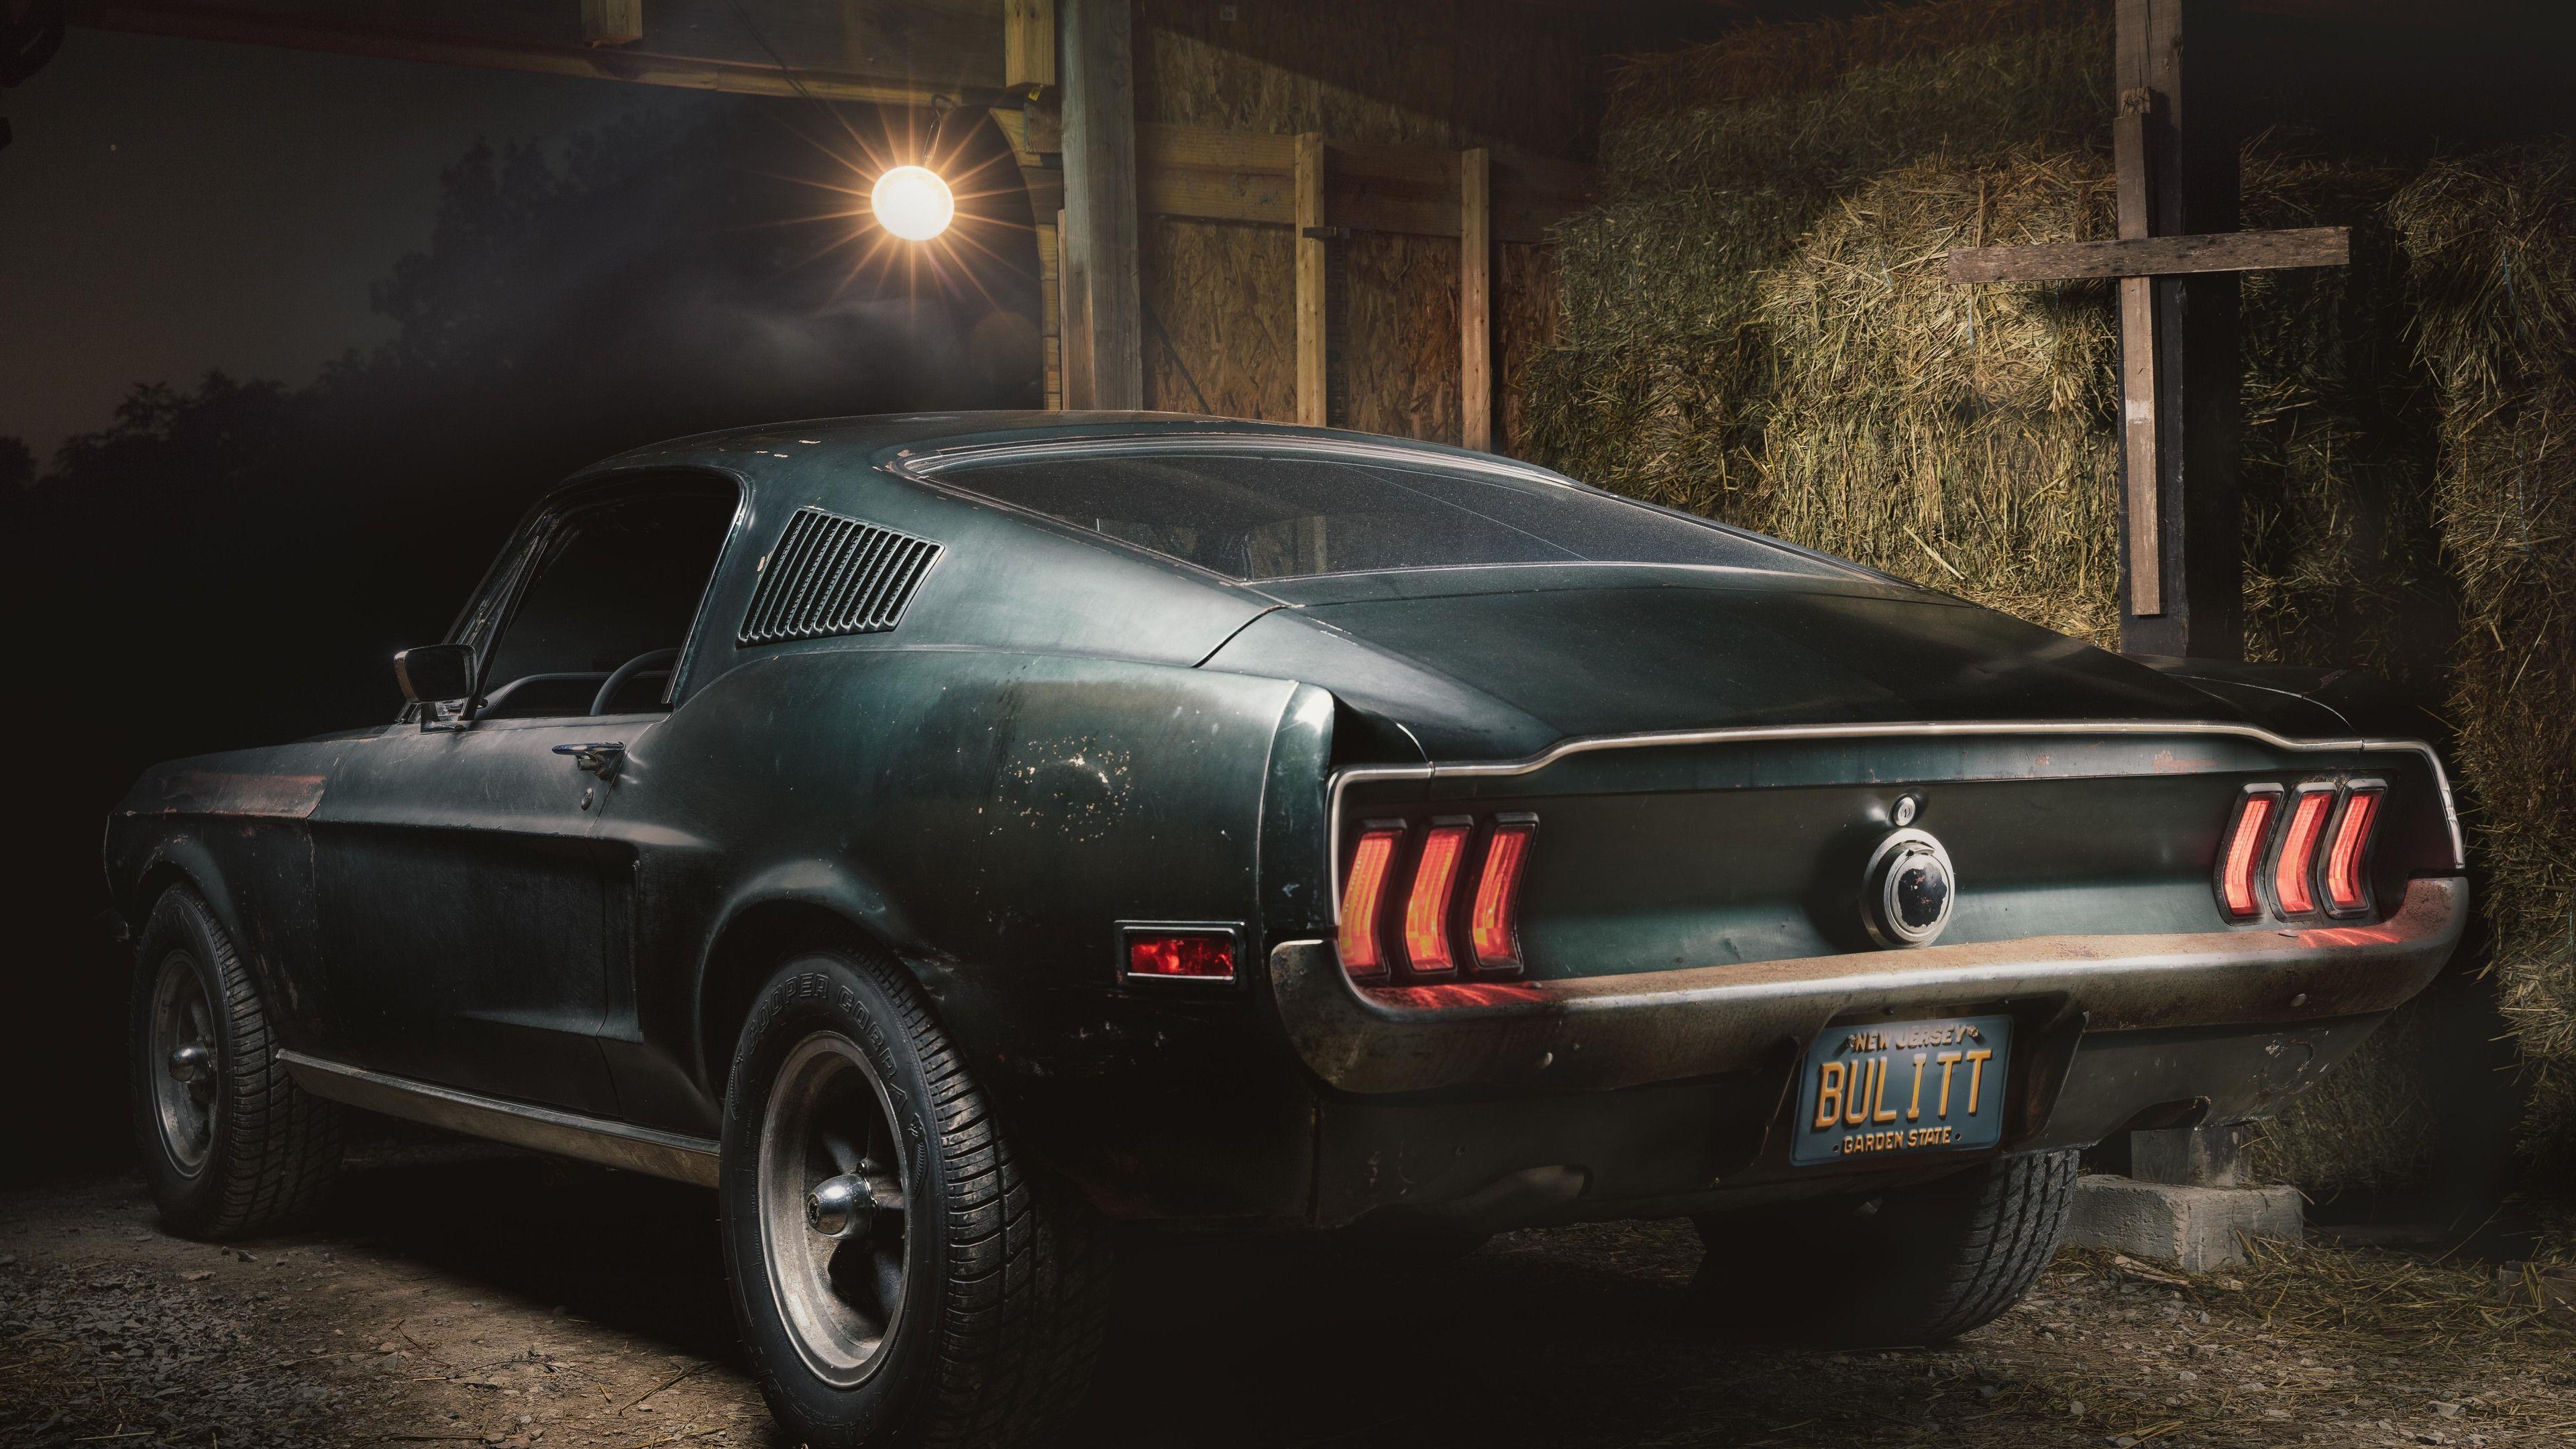 Download wallpaper 3840x2400 mustang, car, muscle car, black for pc & Muscle Car Wallpaper 4k